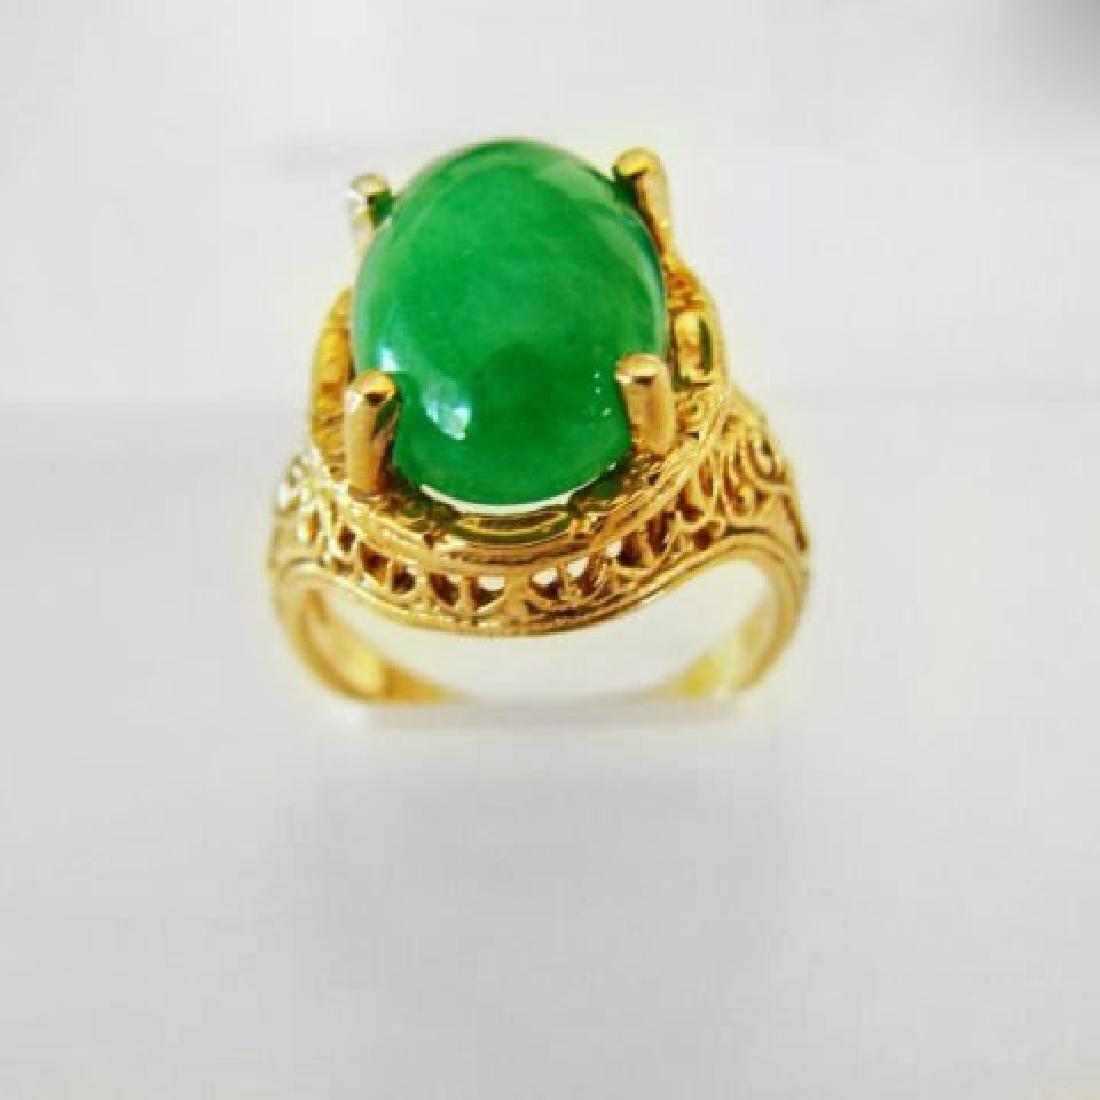 Antique Ring Jadeite Jade 6.82 Carat 14k Yellow Gold - 2